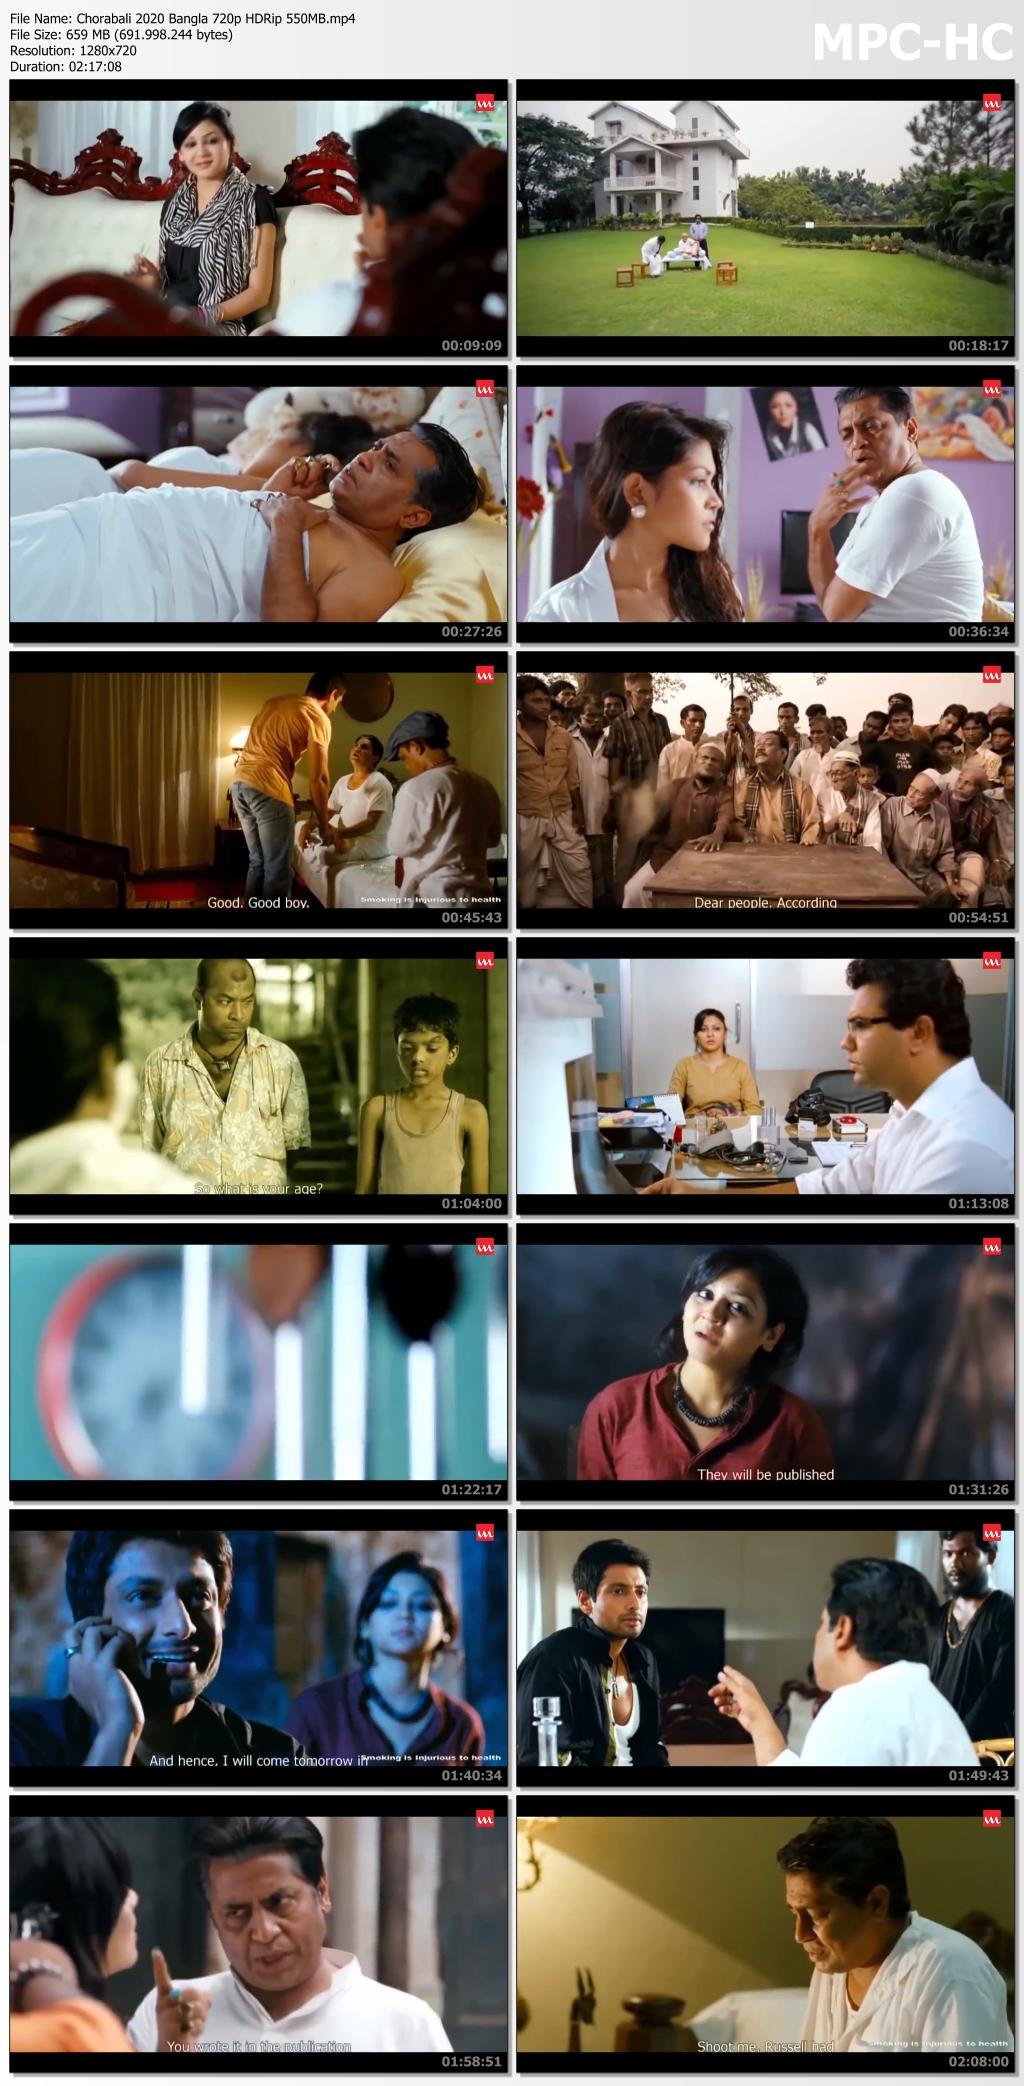 Chorabali-2020-Bangla-720p-HDRip-550-MB-mp4-thumbs